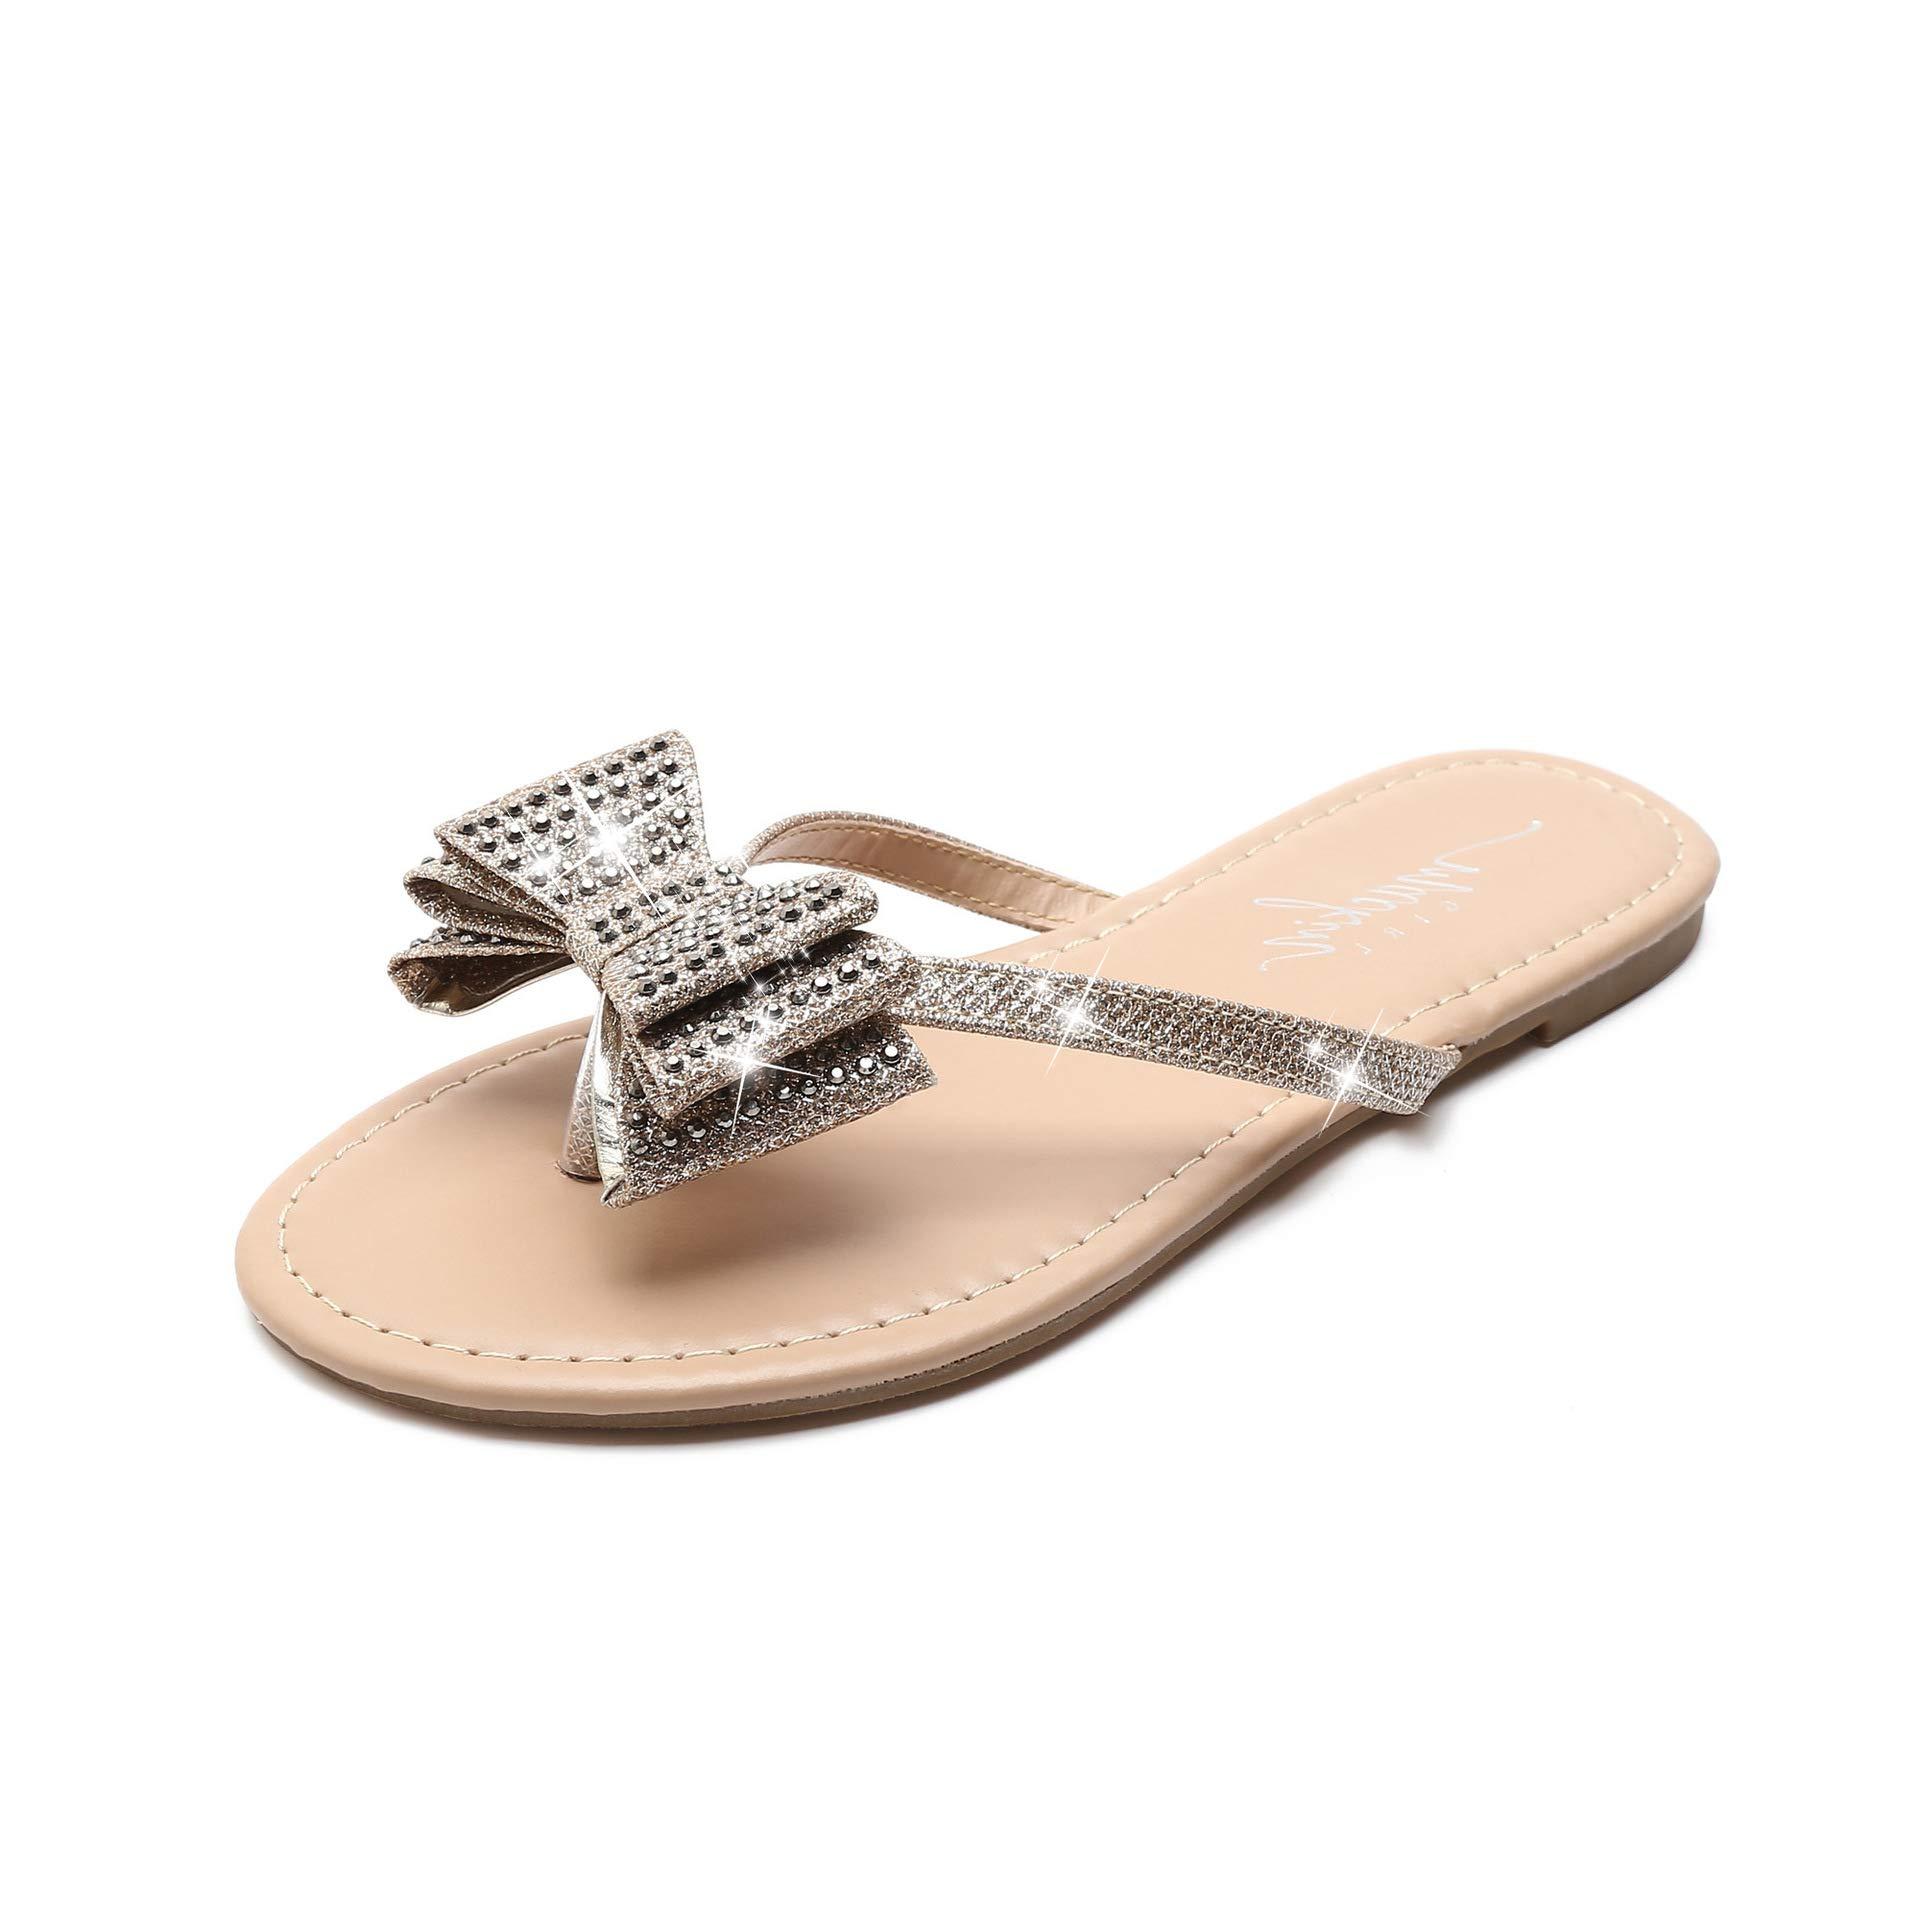 MACKIN J G504-1 Women's Flip Flops Rhinestones Bow Thong Flat Dress Sandals